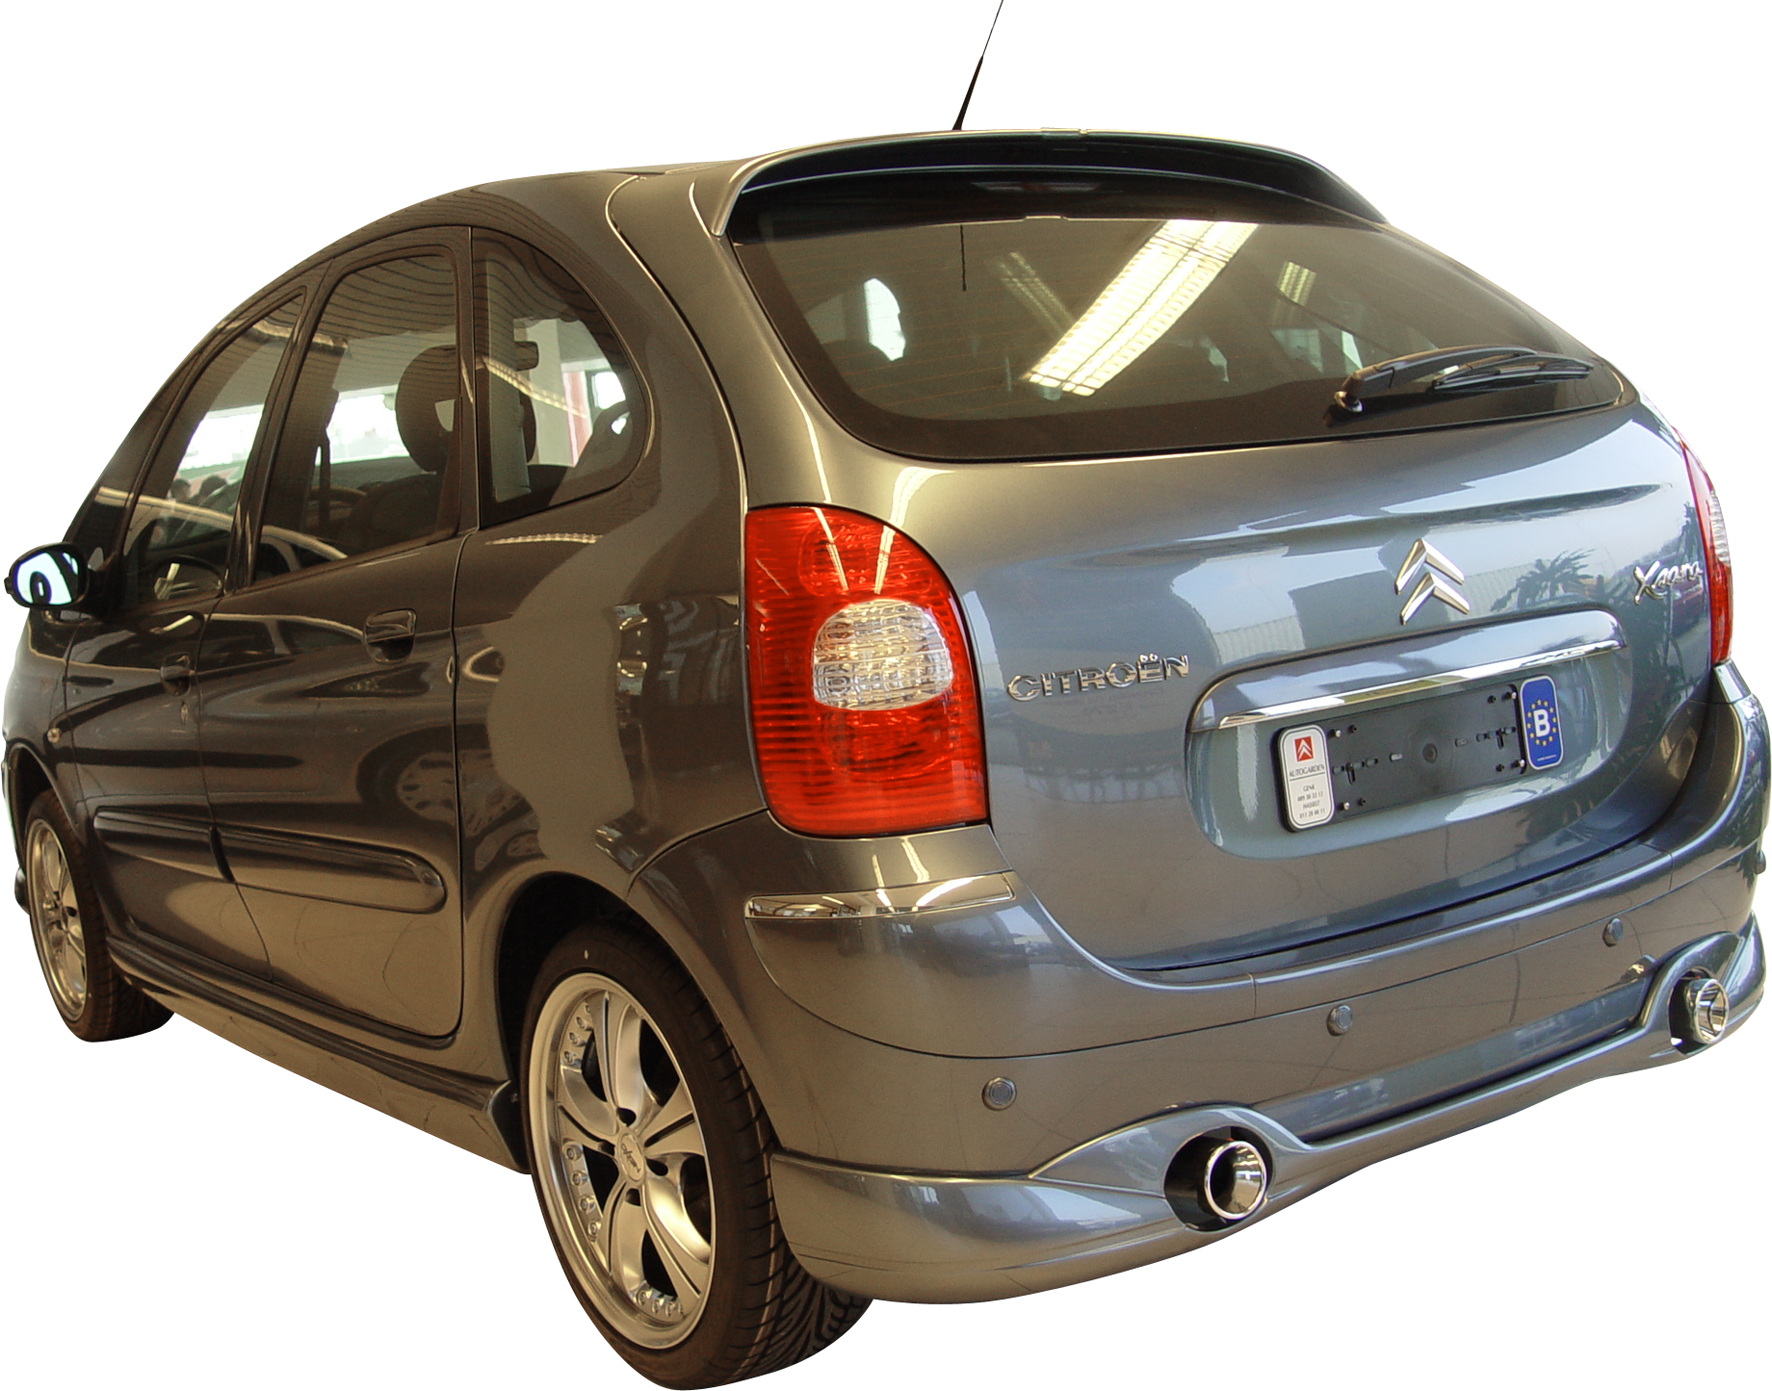 showoff imports citroen xsara picasso ii double exhaust rear bumper lip c. Black Bedroom Furniture Sets. Home Design Ideas